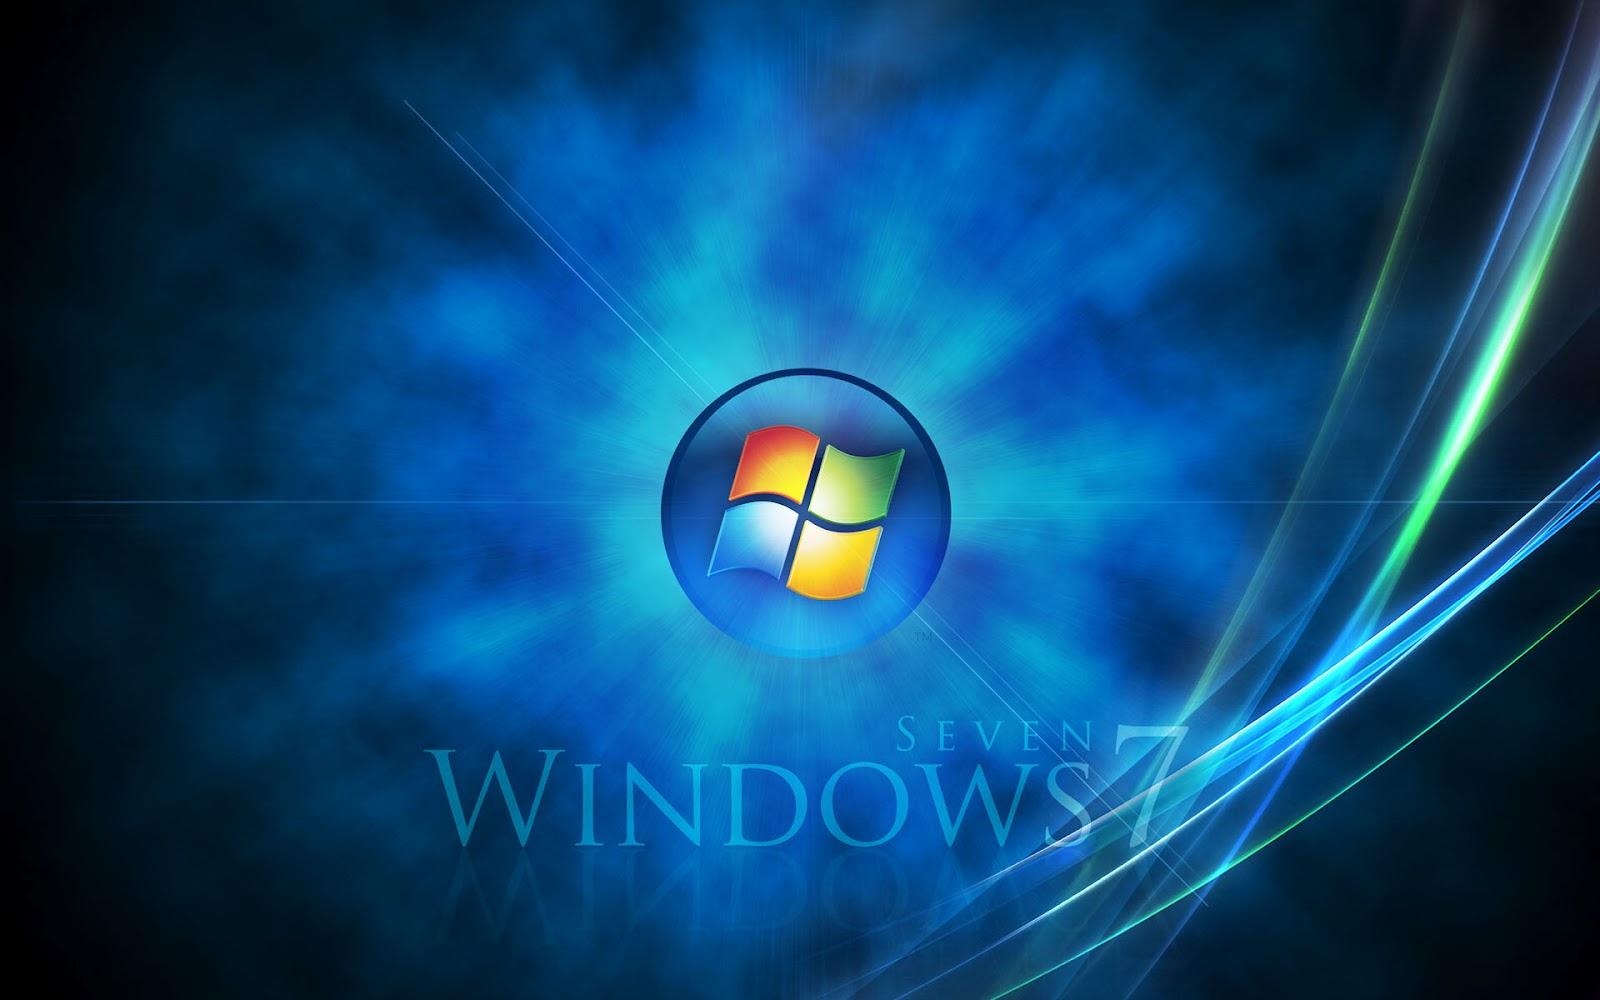 desktop wallpaper windows 7 freeanimated desktop wallpaper windows 7 1600x1000